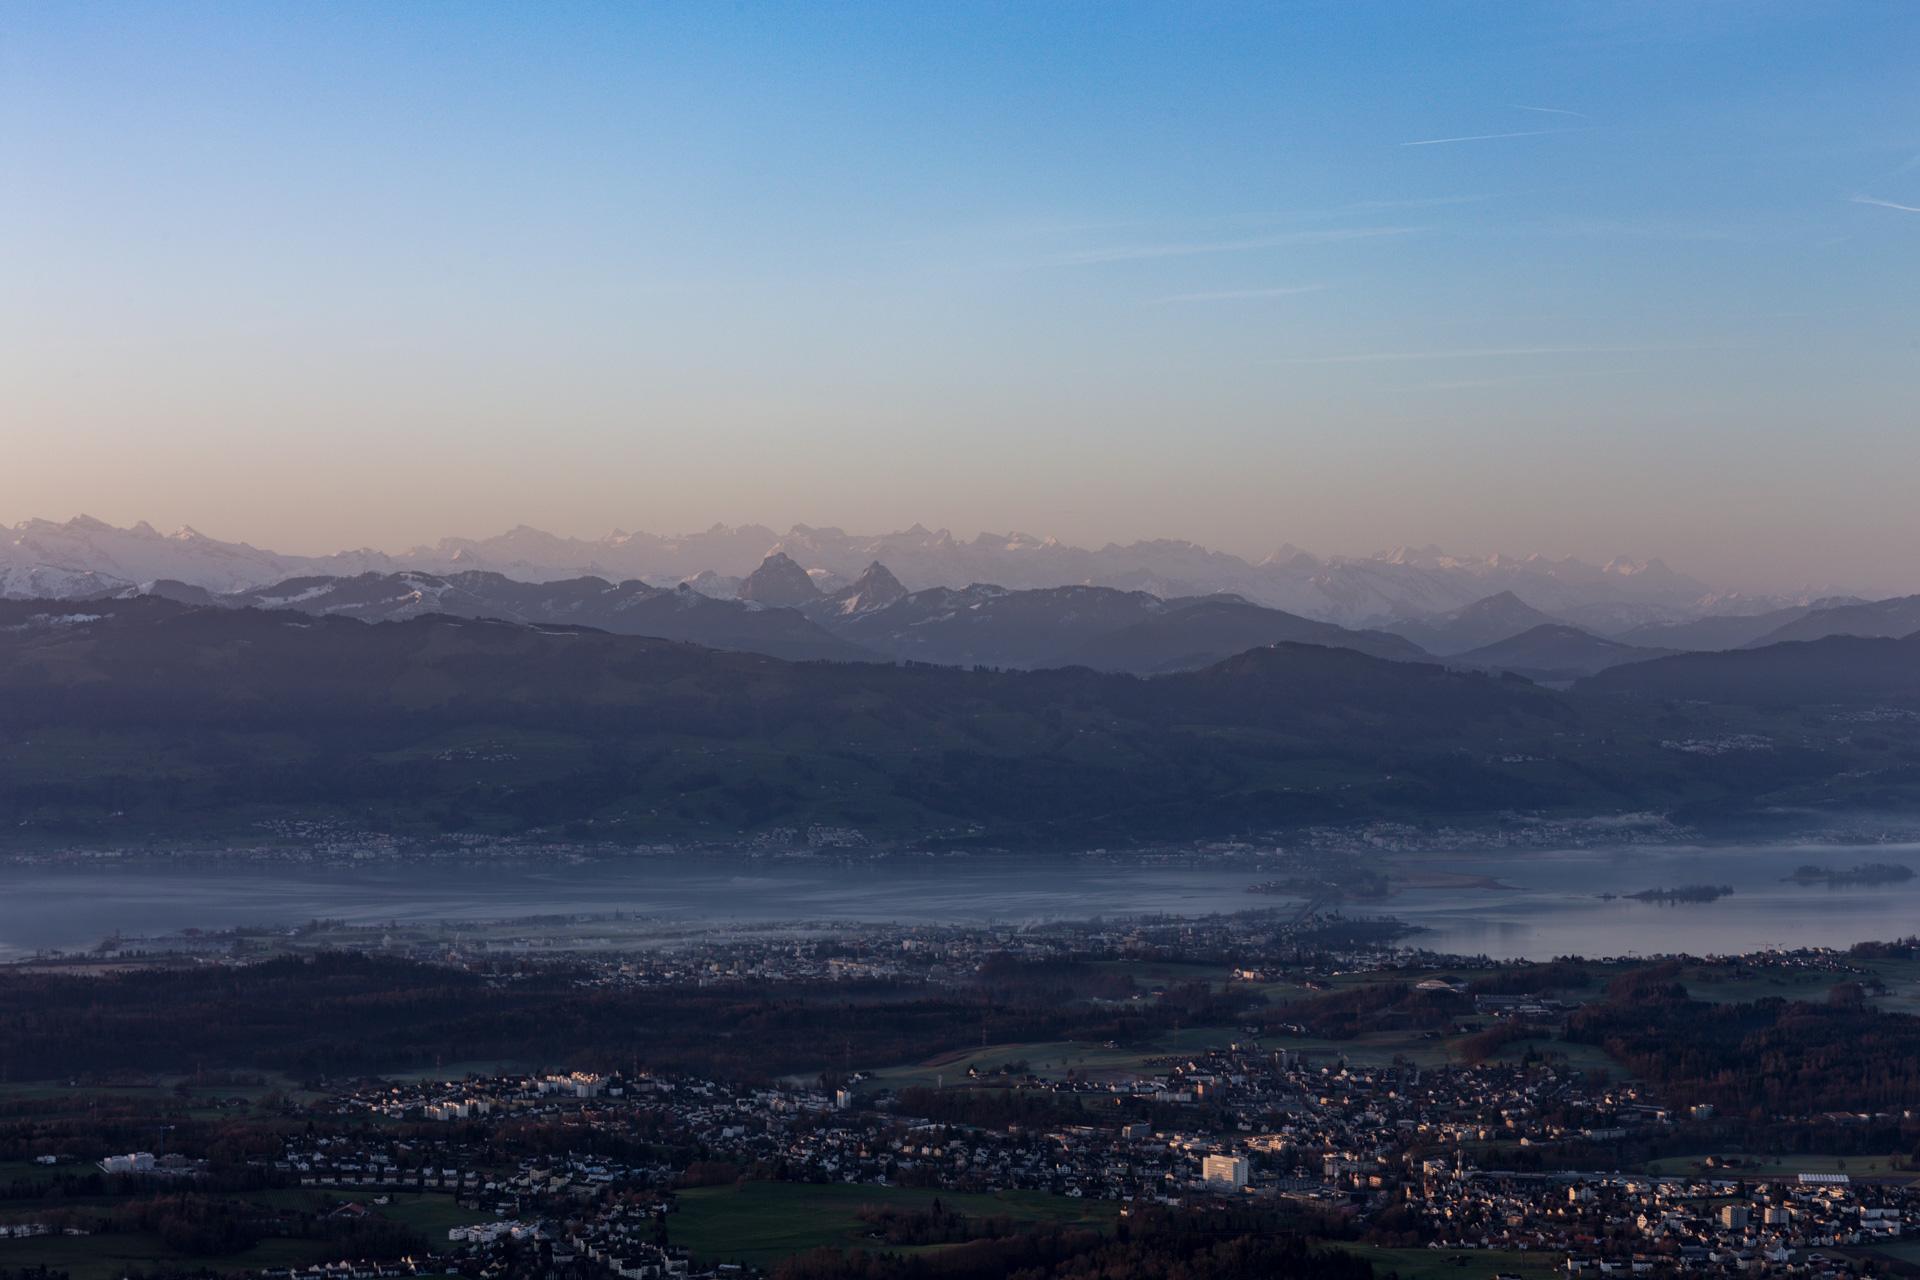 Sonnenaufgang-Bachtelturm_20151219_5986-1